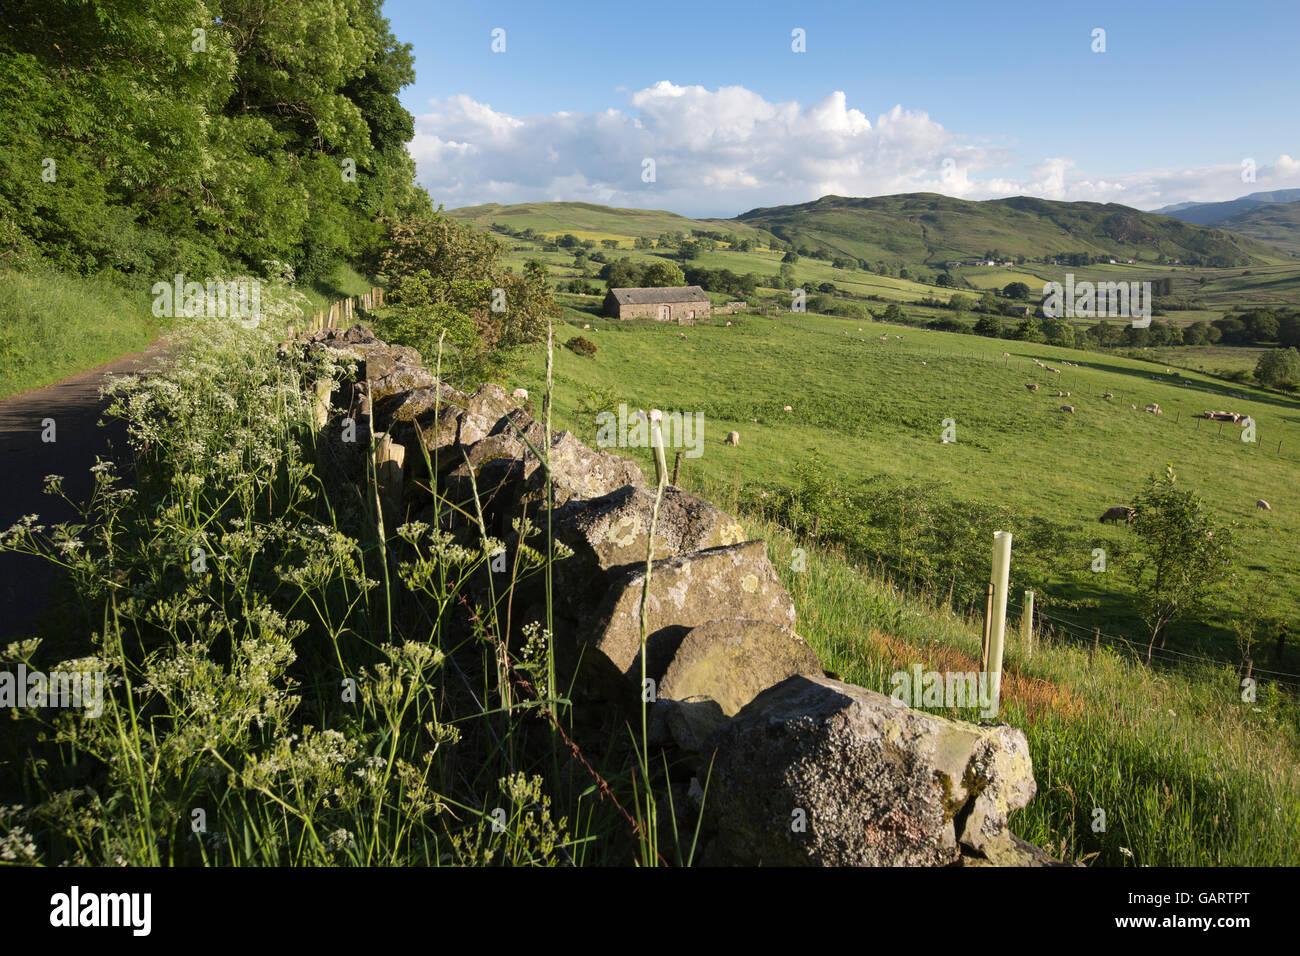 Matterdale, Eden Valley, Lake District, Cumbria, England, UK - Stock Image